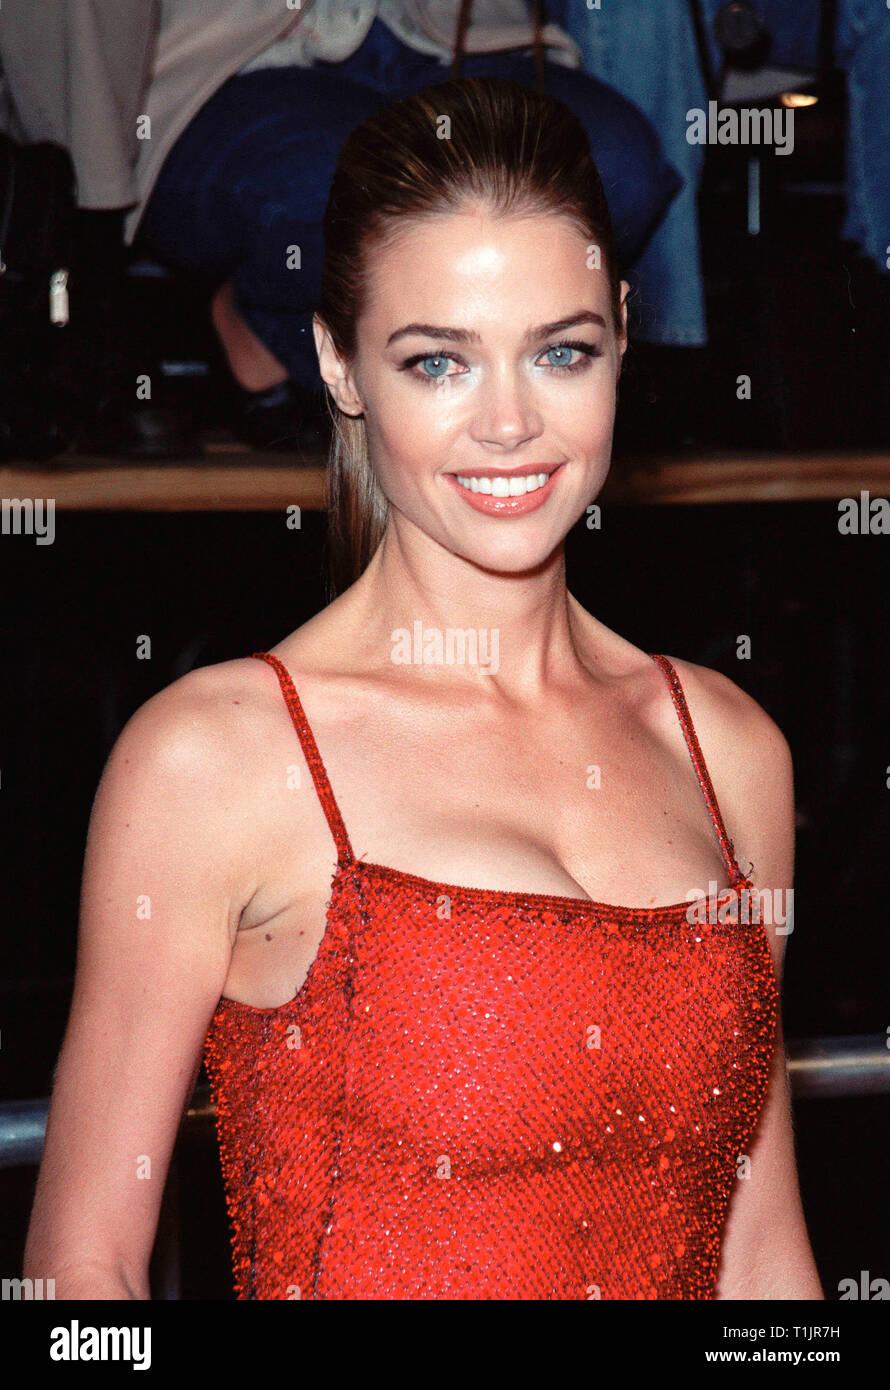 Los Angeles Ca November 09 1999 Actress Denise Richards